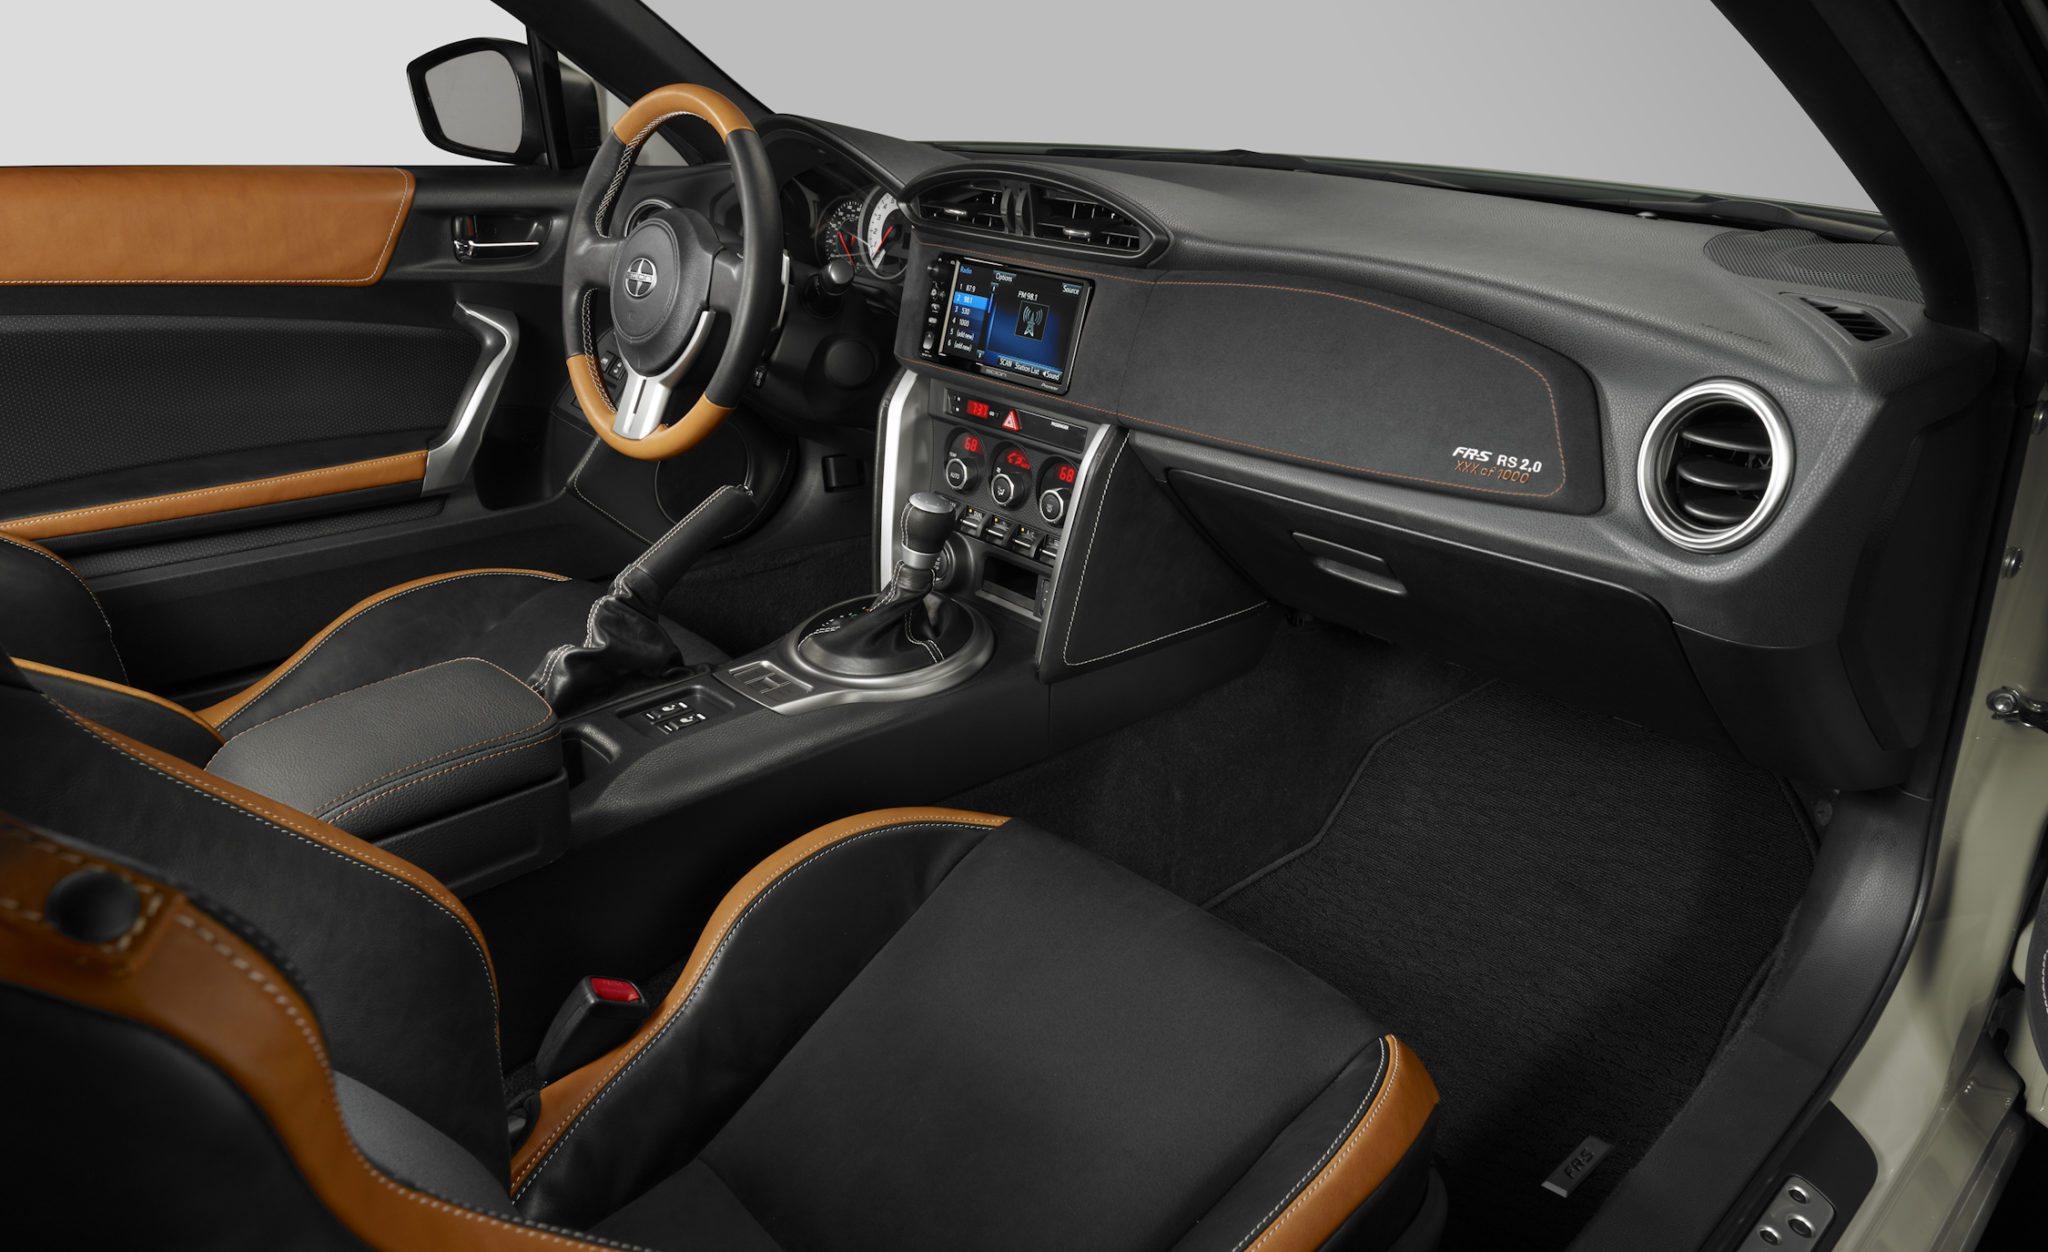 Scion Announces Un-Lame FR-S Release Series 2.0, Just 1000 Will Be Built 1